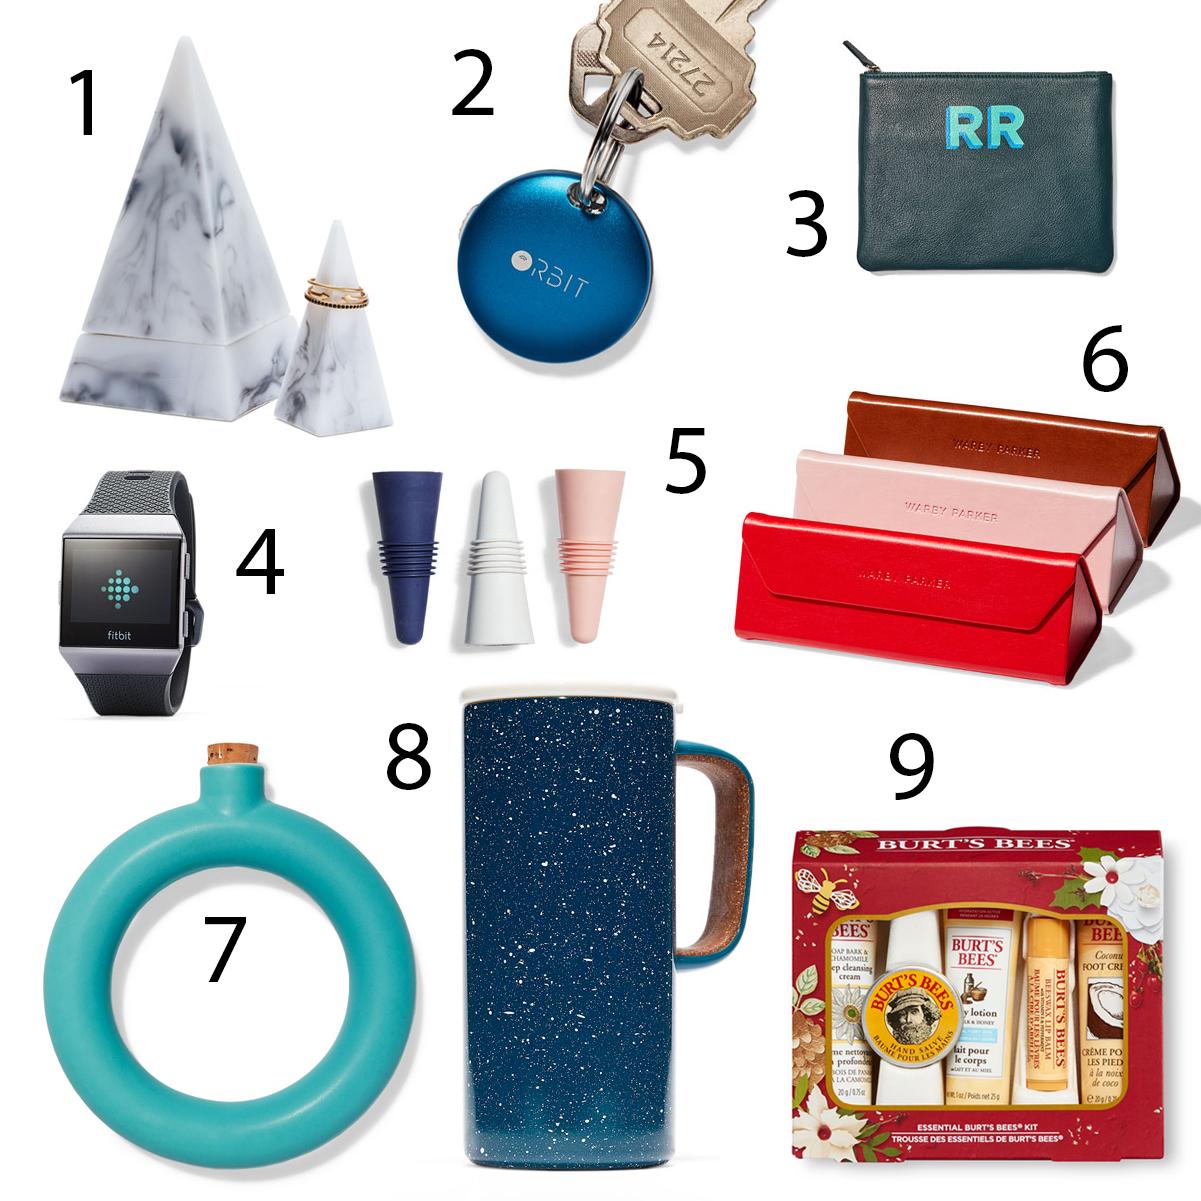 small stuff gift guide